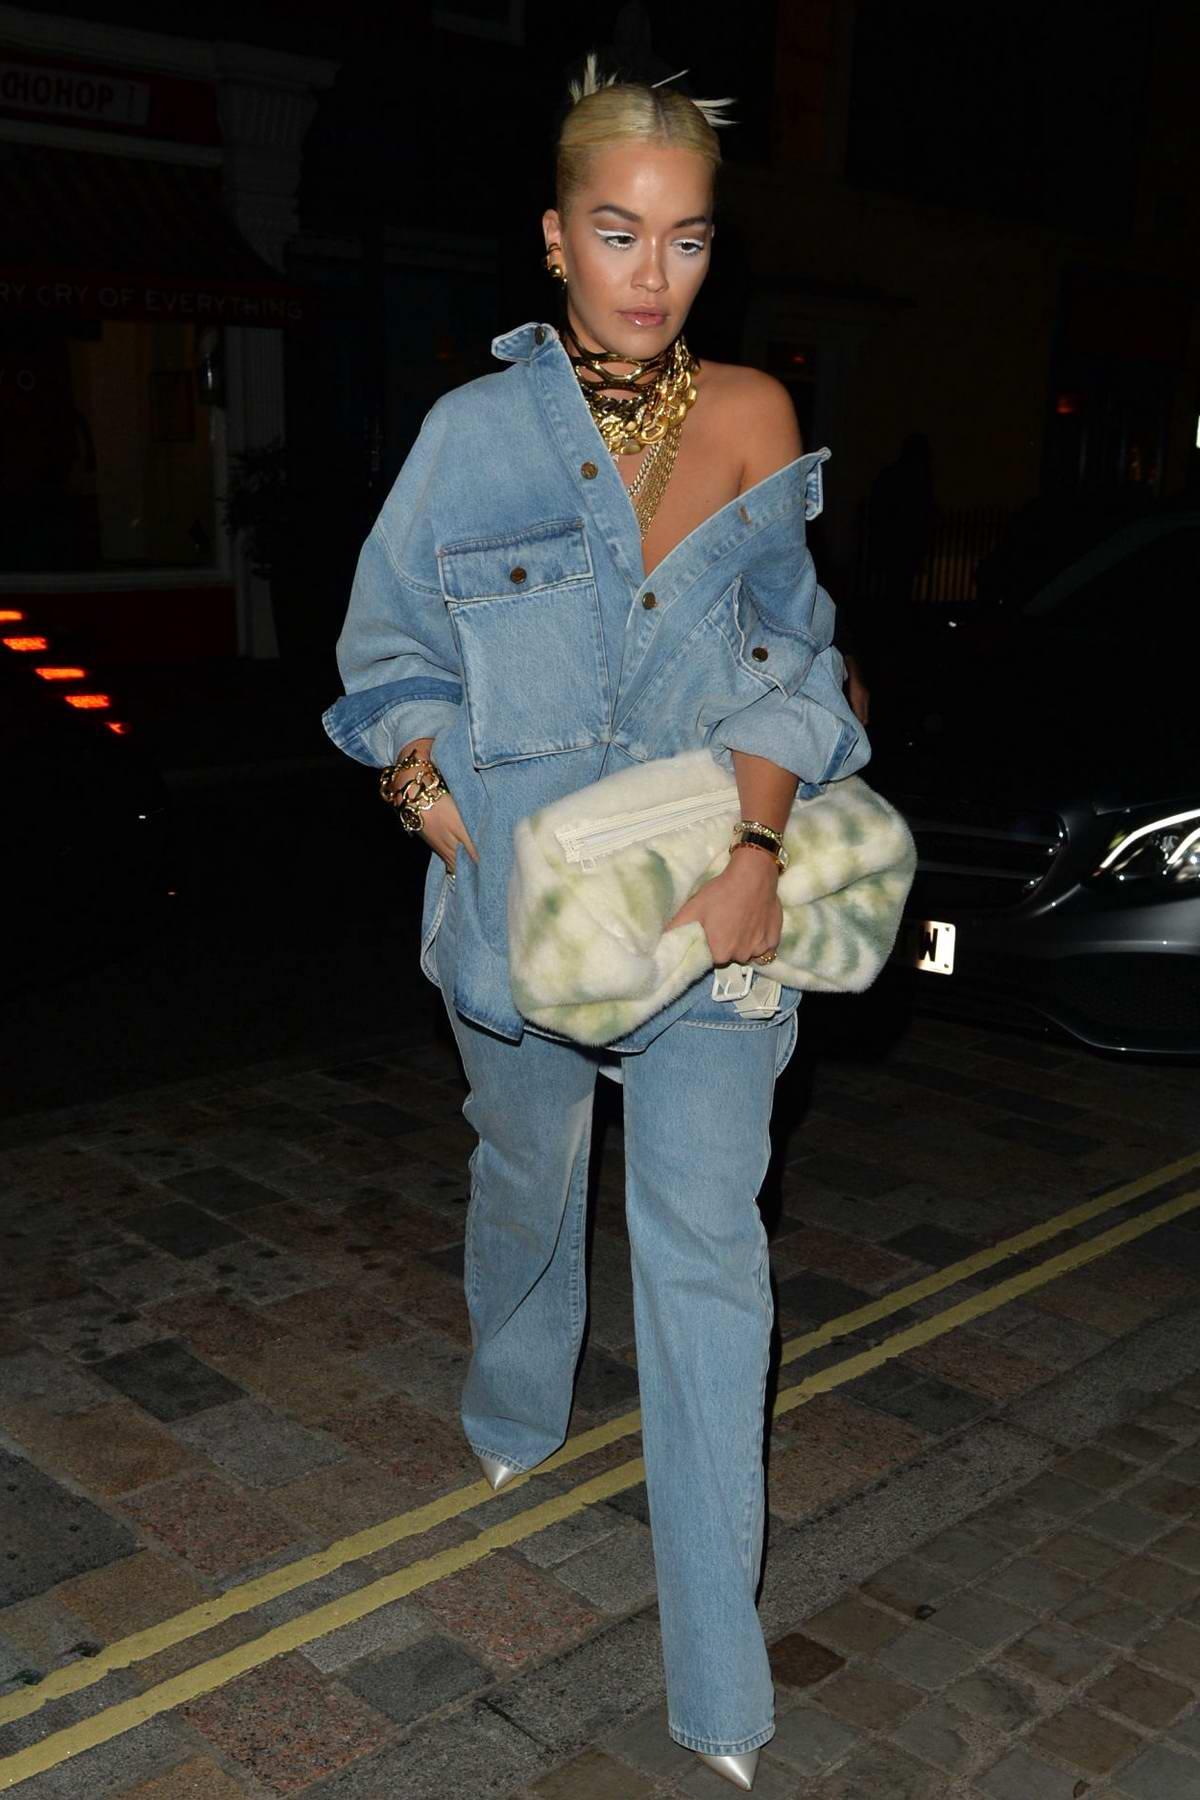 Rita Ora rocks double denim as she arrives at Chiltern Firehouse in London, UK